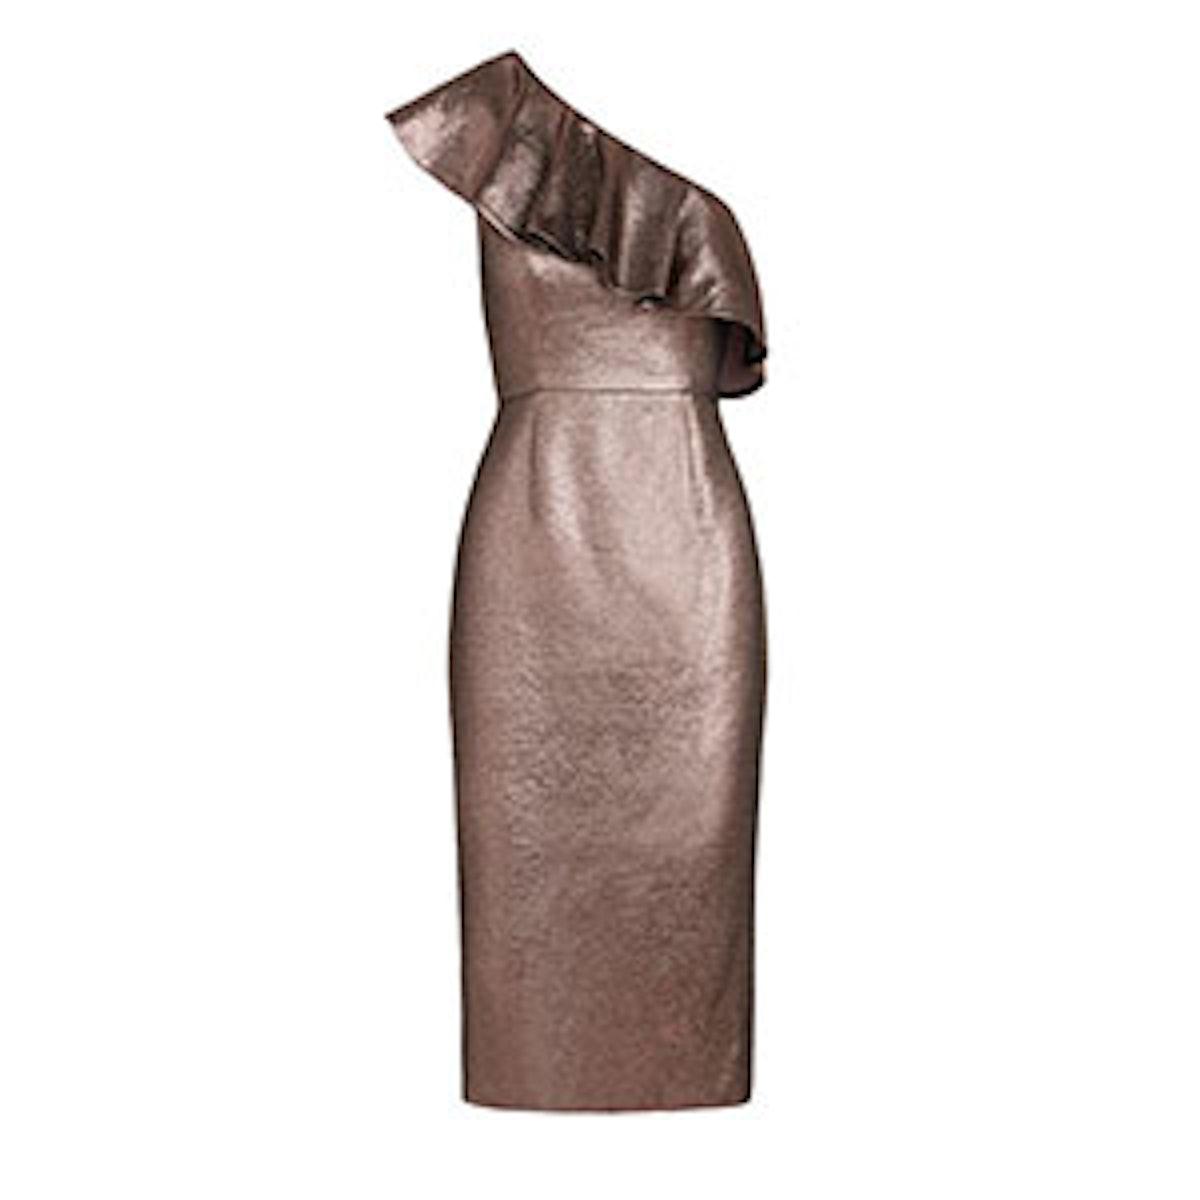 Tabitha Mauve Metallic Jacquard One-Shoulder Dress